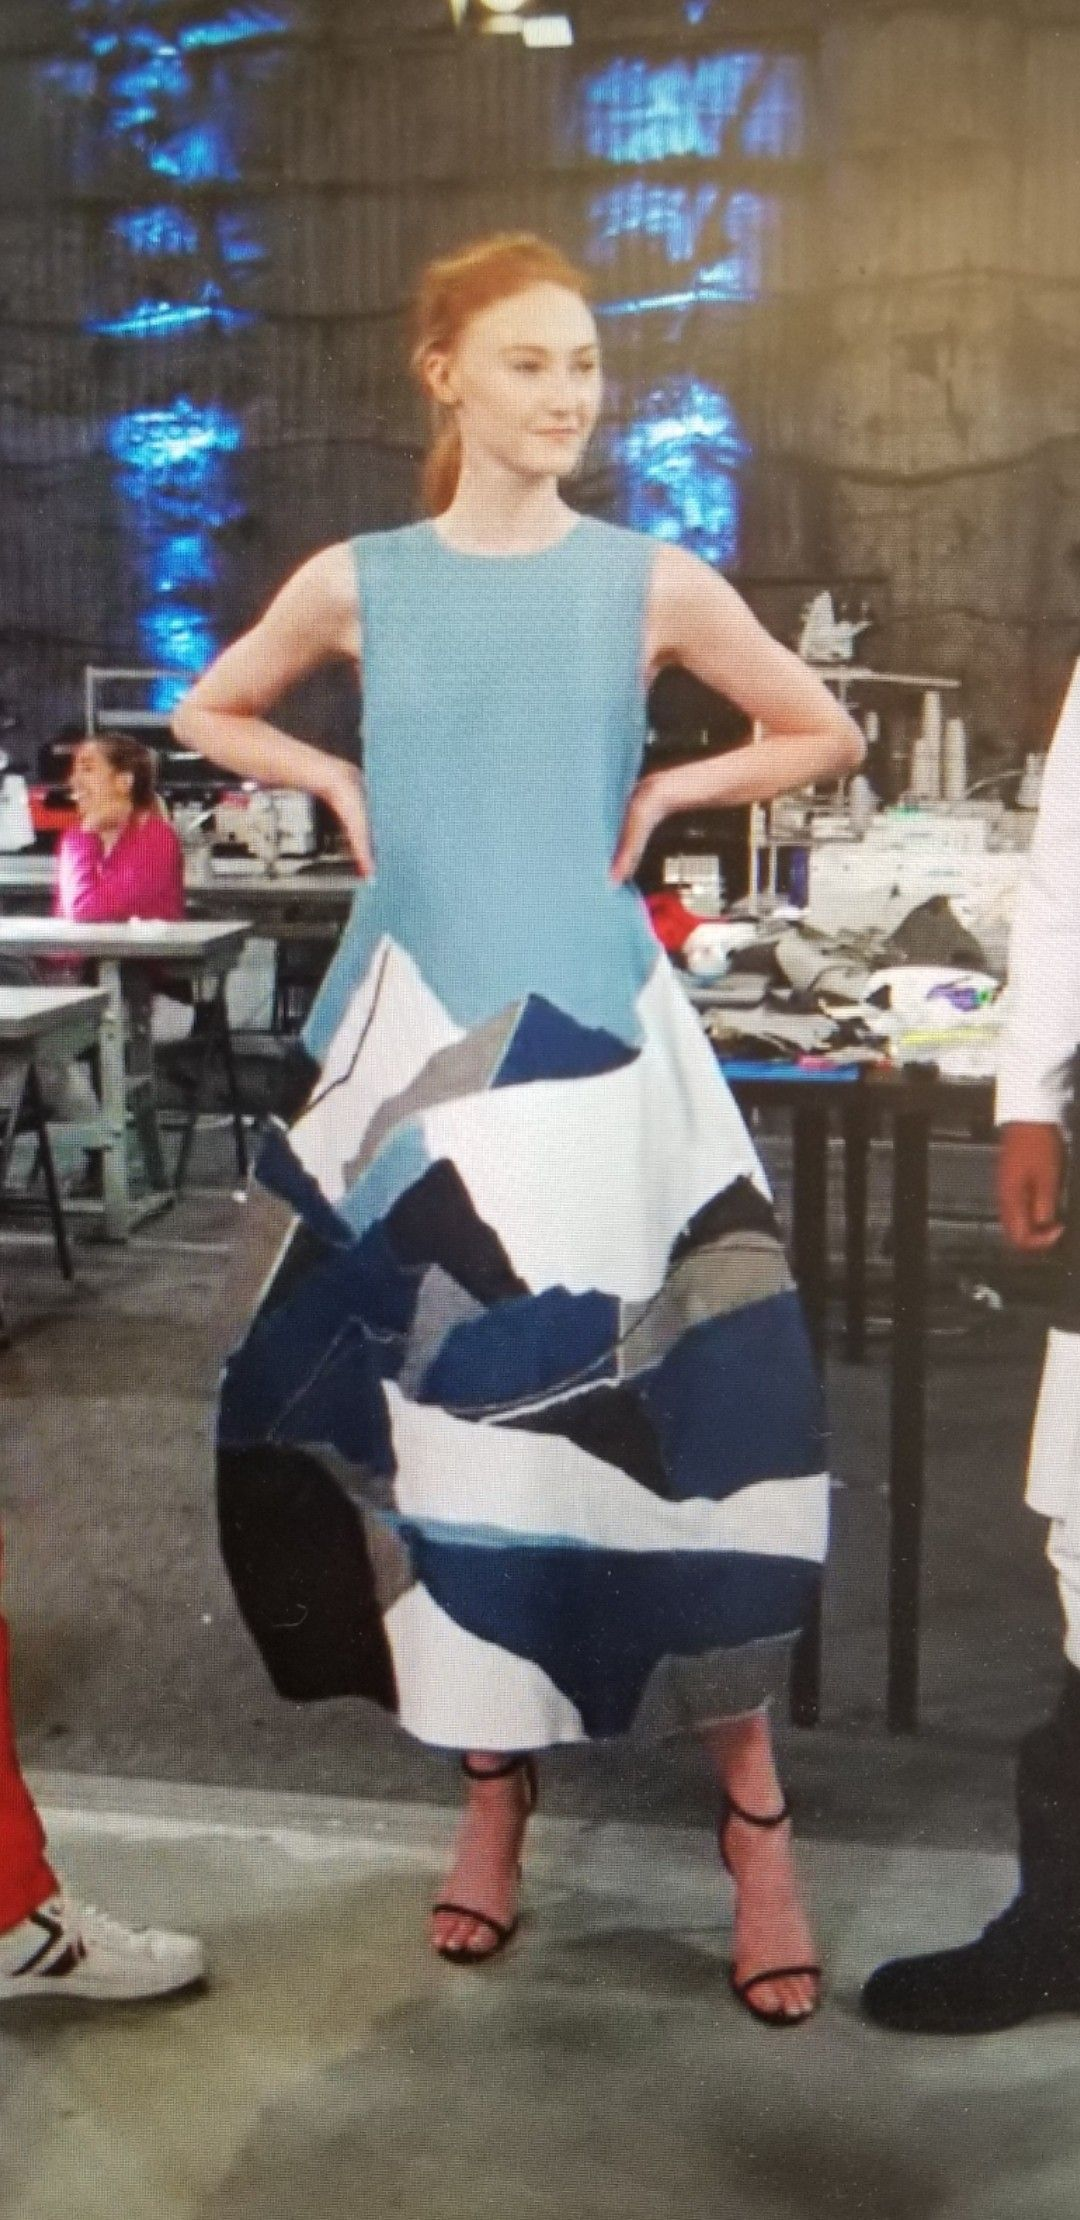 Daniel Fletcher denim scraps dress | Fashion, Denim fashion, Denim scraps